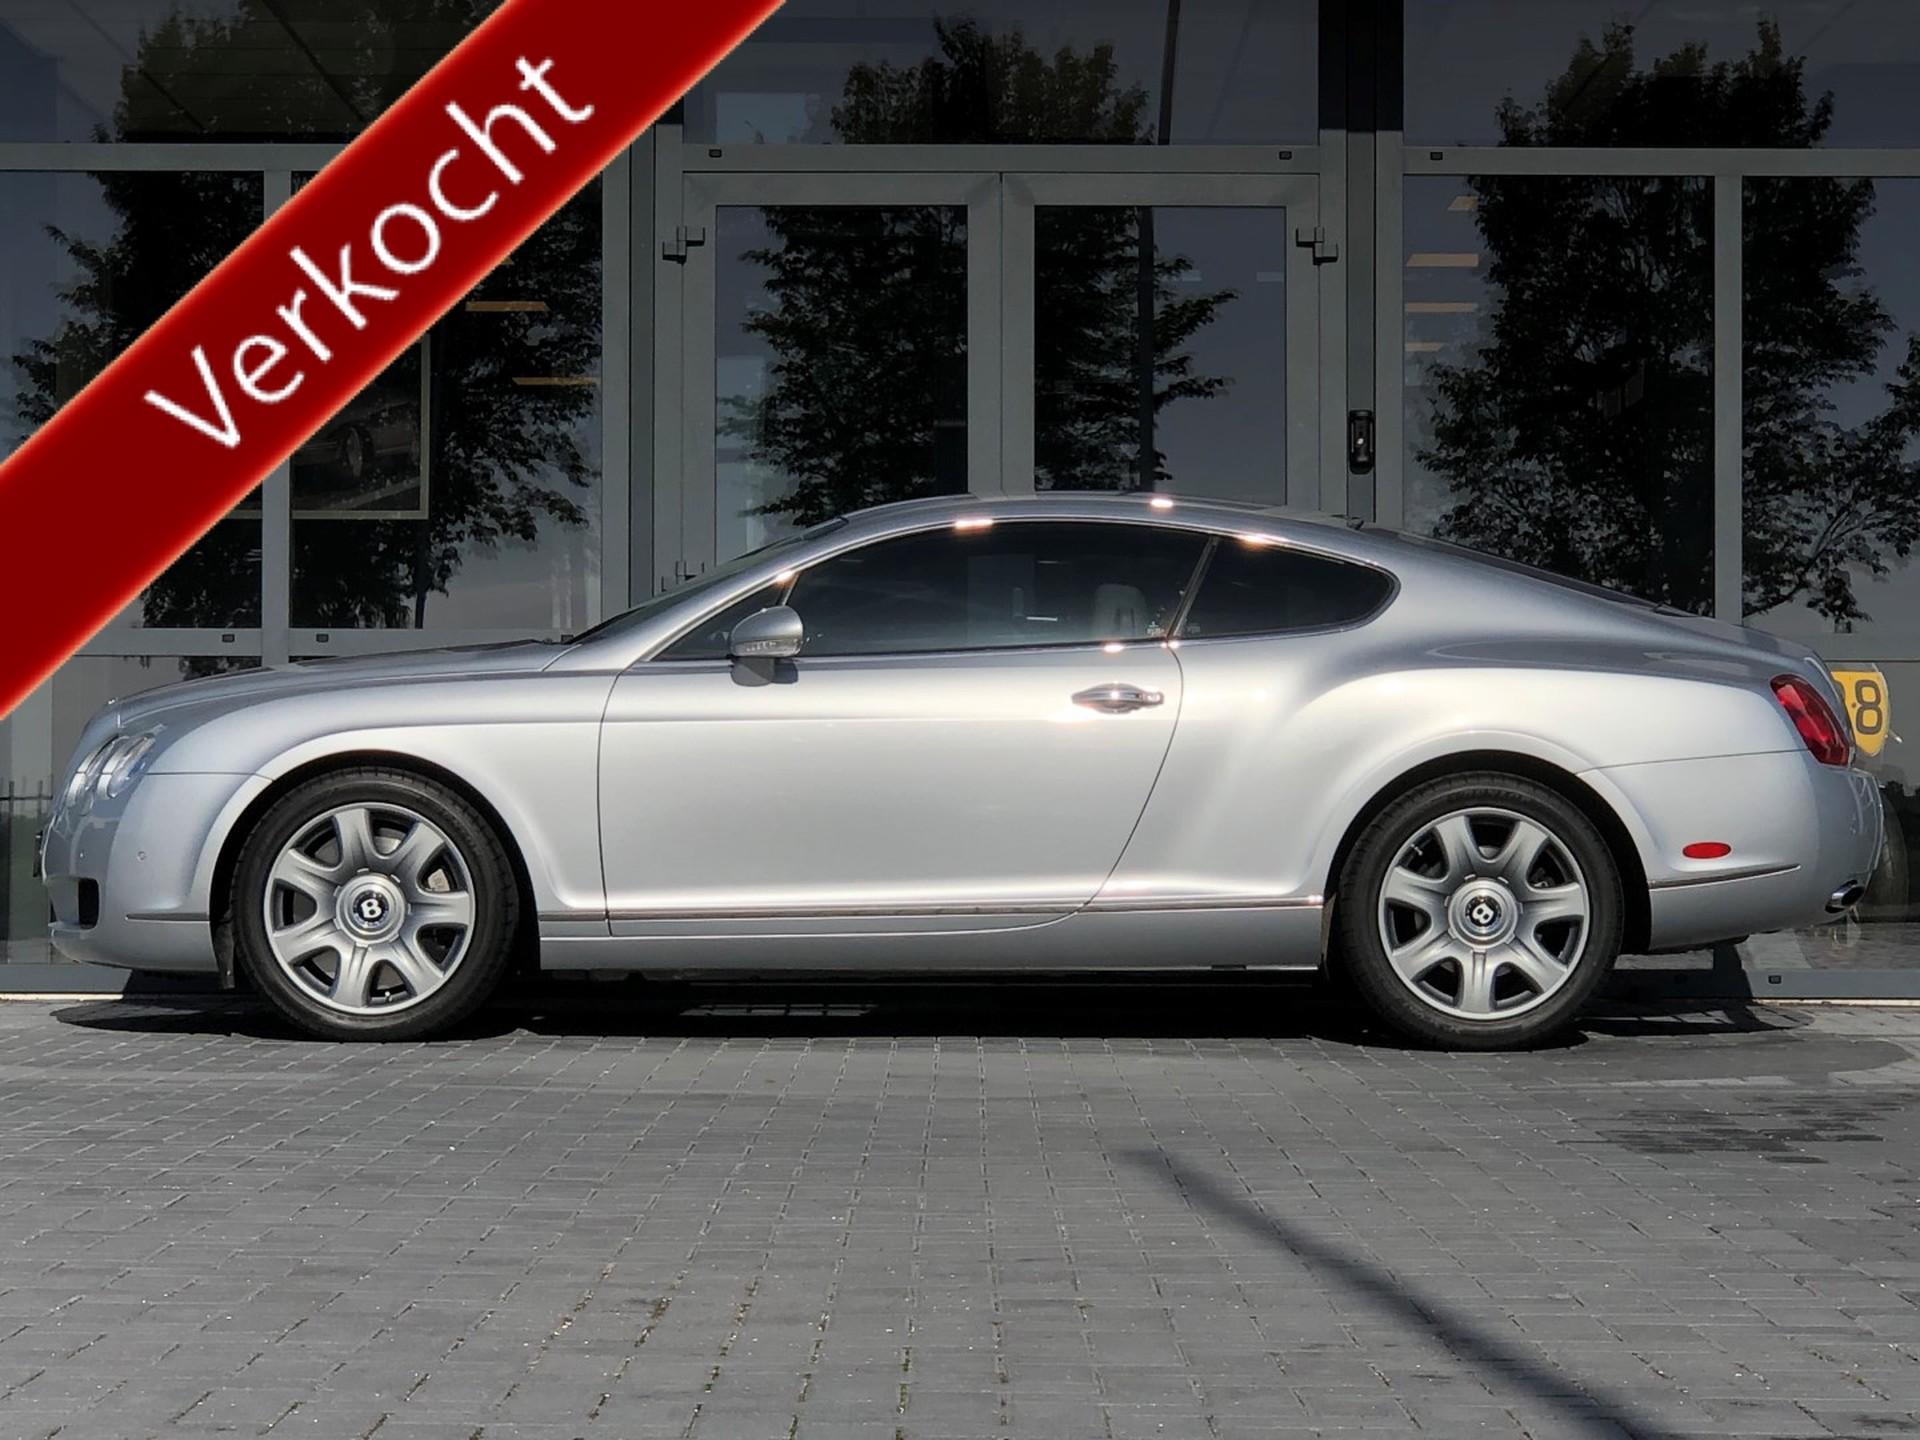 Bentley-Continental GT-6.0 W12-Auto Jonkman